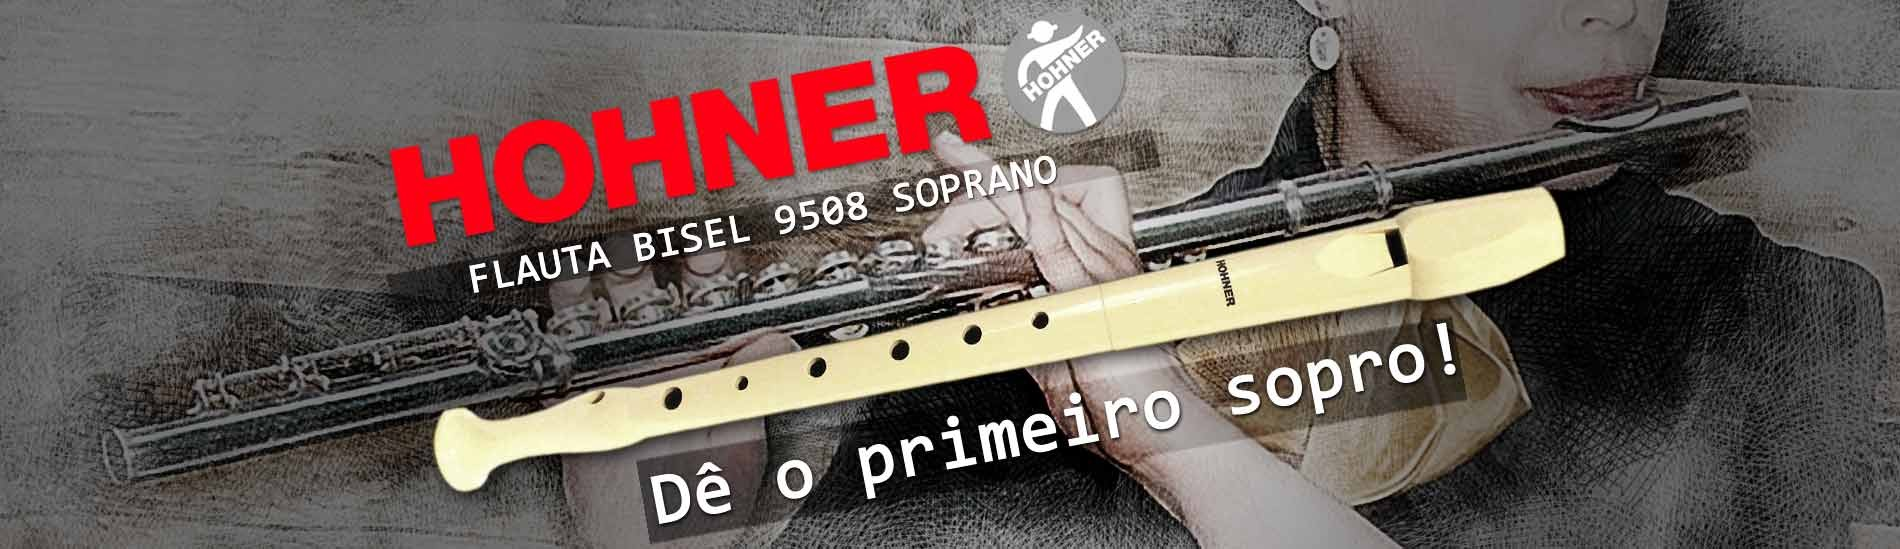 Flauta Bisel Hohner 9508 Soprano